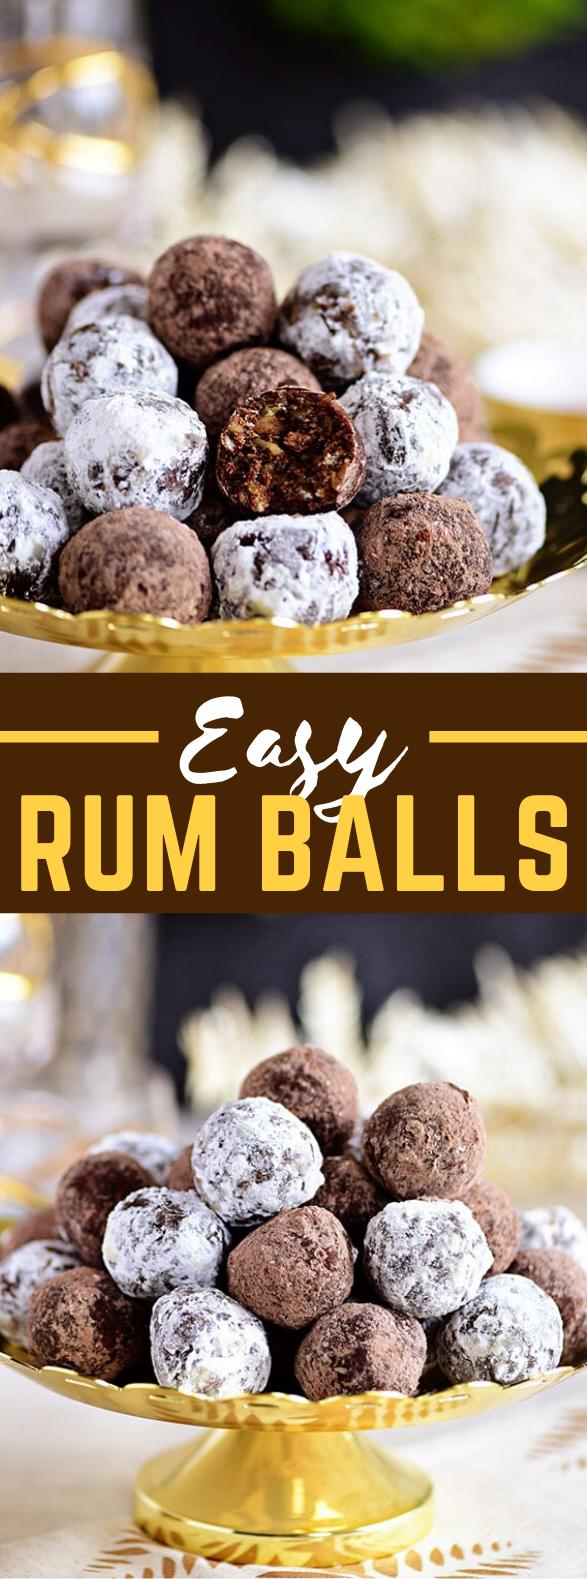 EASY HOLIDAY RUM BALLS RECIPE #desserts #chocolate